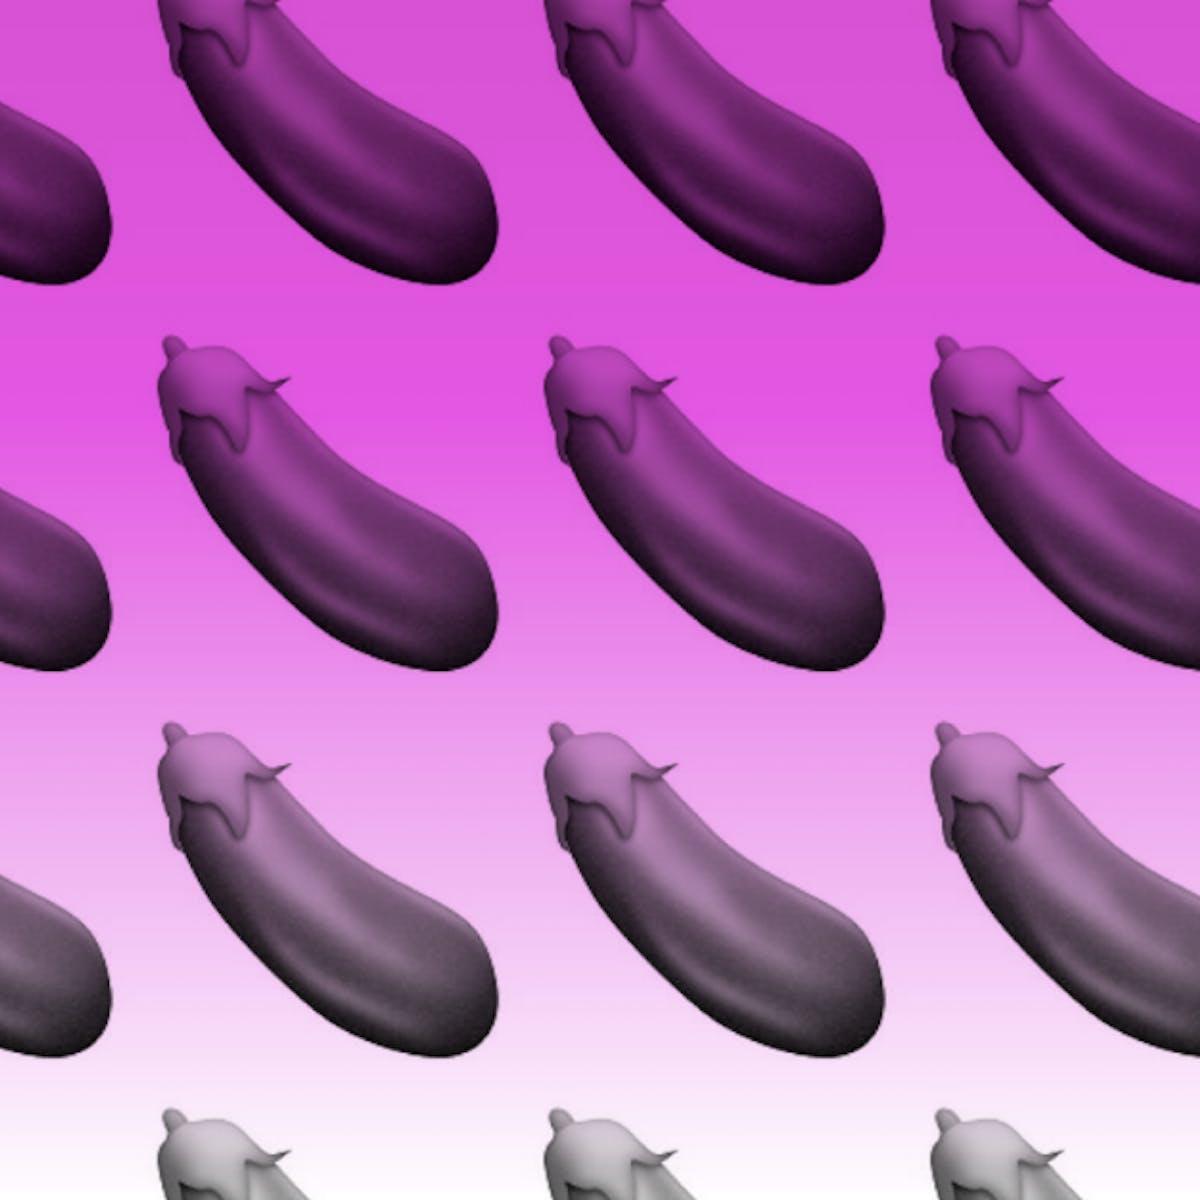 Having Big Genitals Sometimes Leads to Extinction, Say Paleobiologists